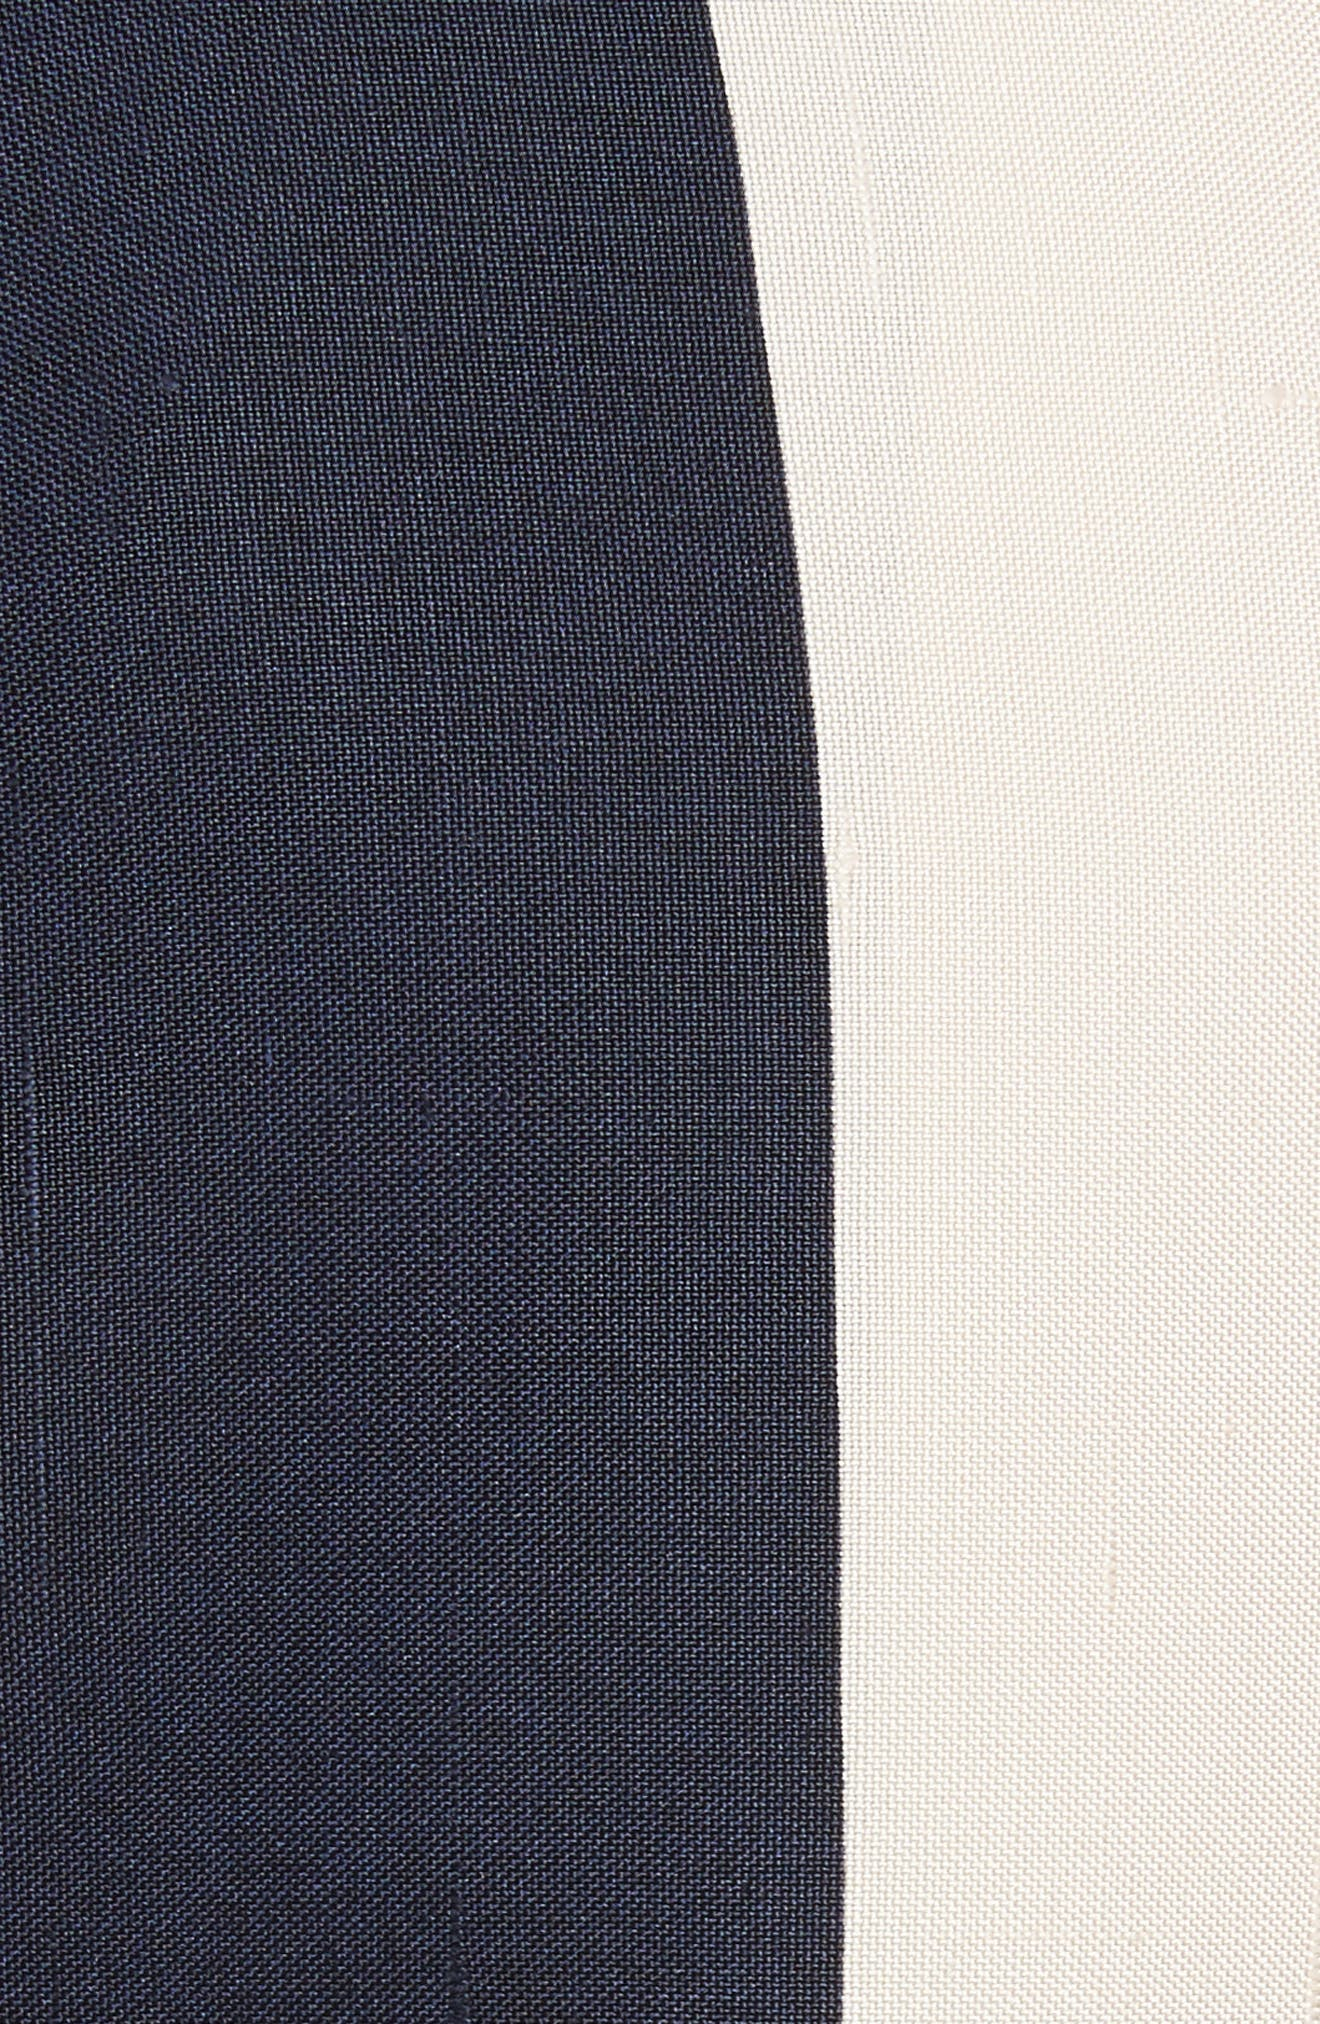 Alternate Image 6  - Calvin Klein 205W39NYC Flag Stripe Silk Shantung Drape Skirt